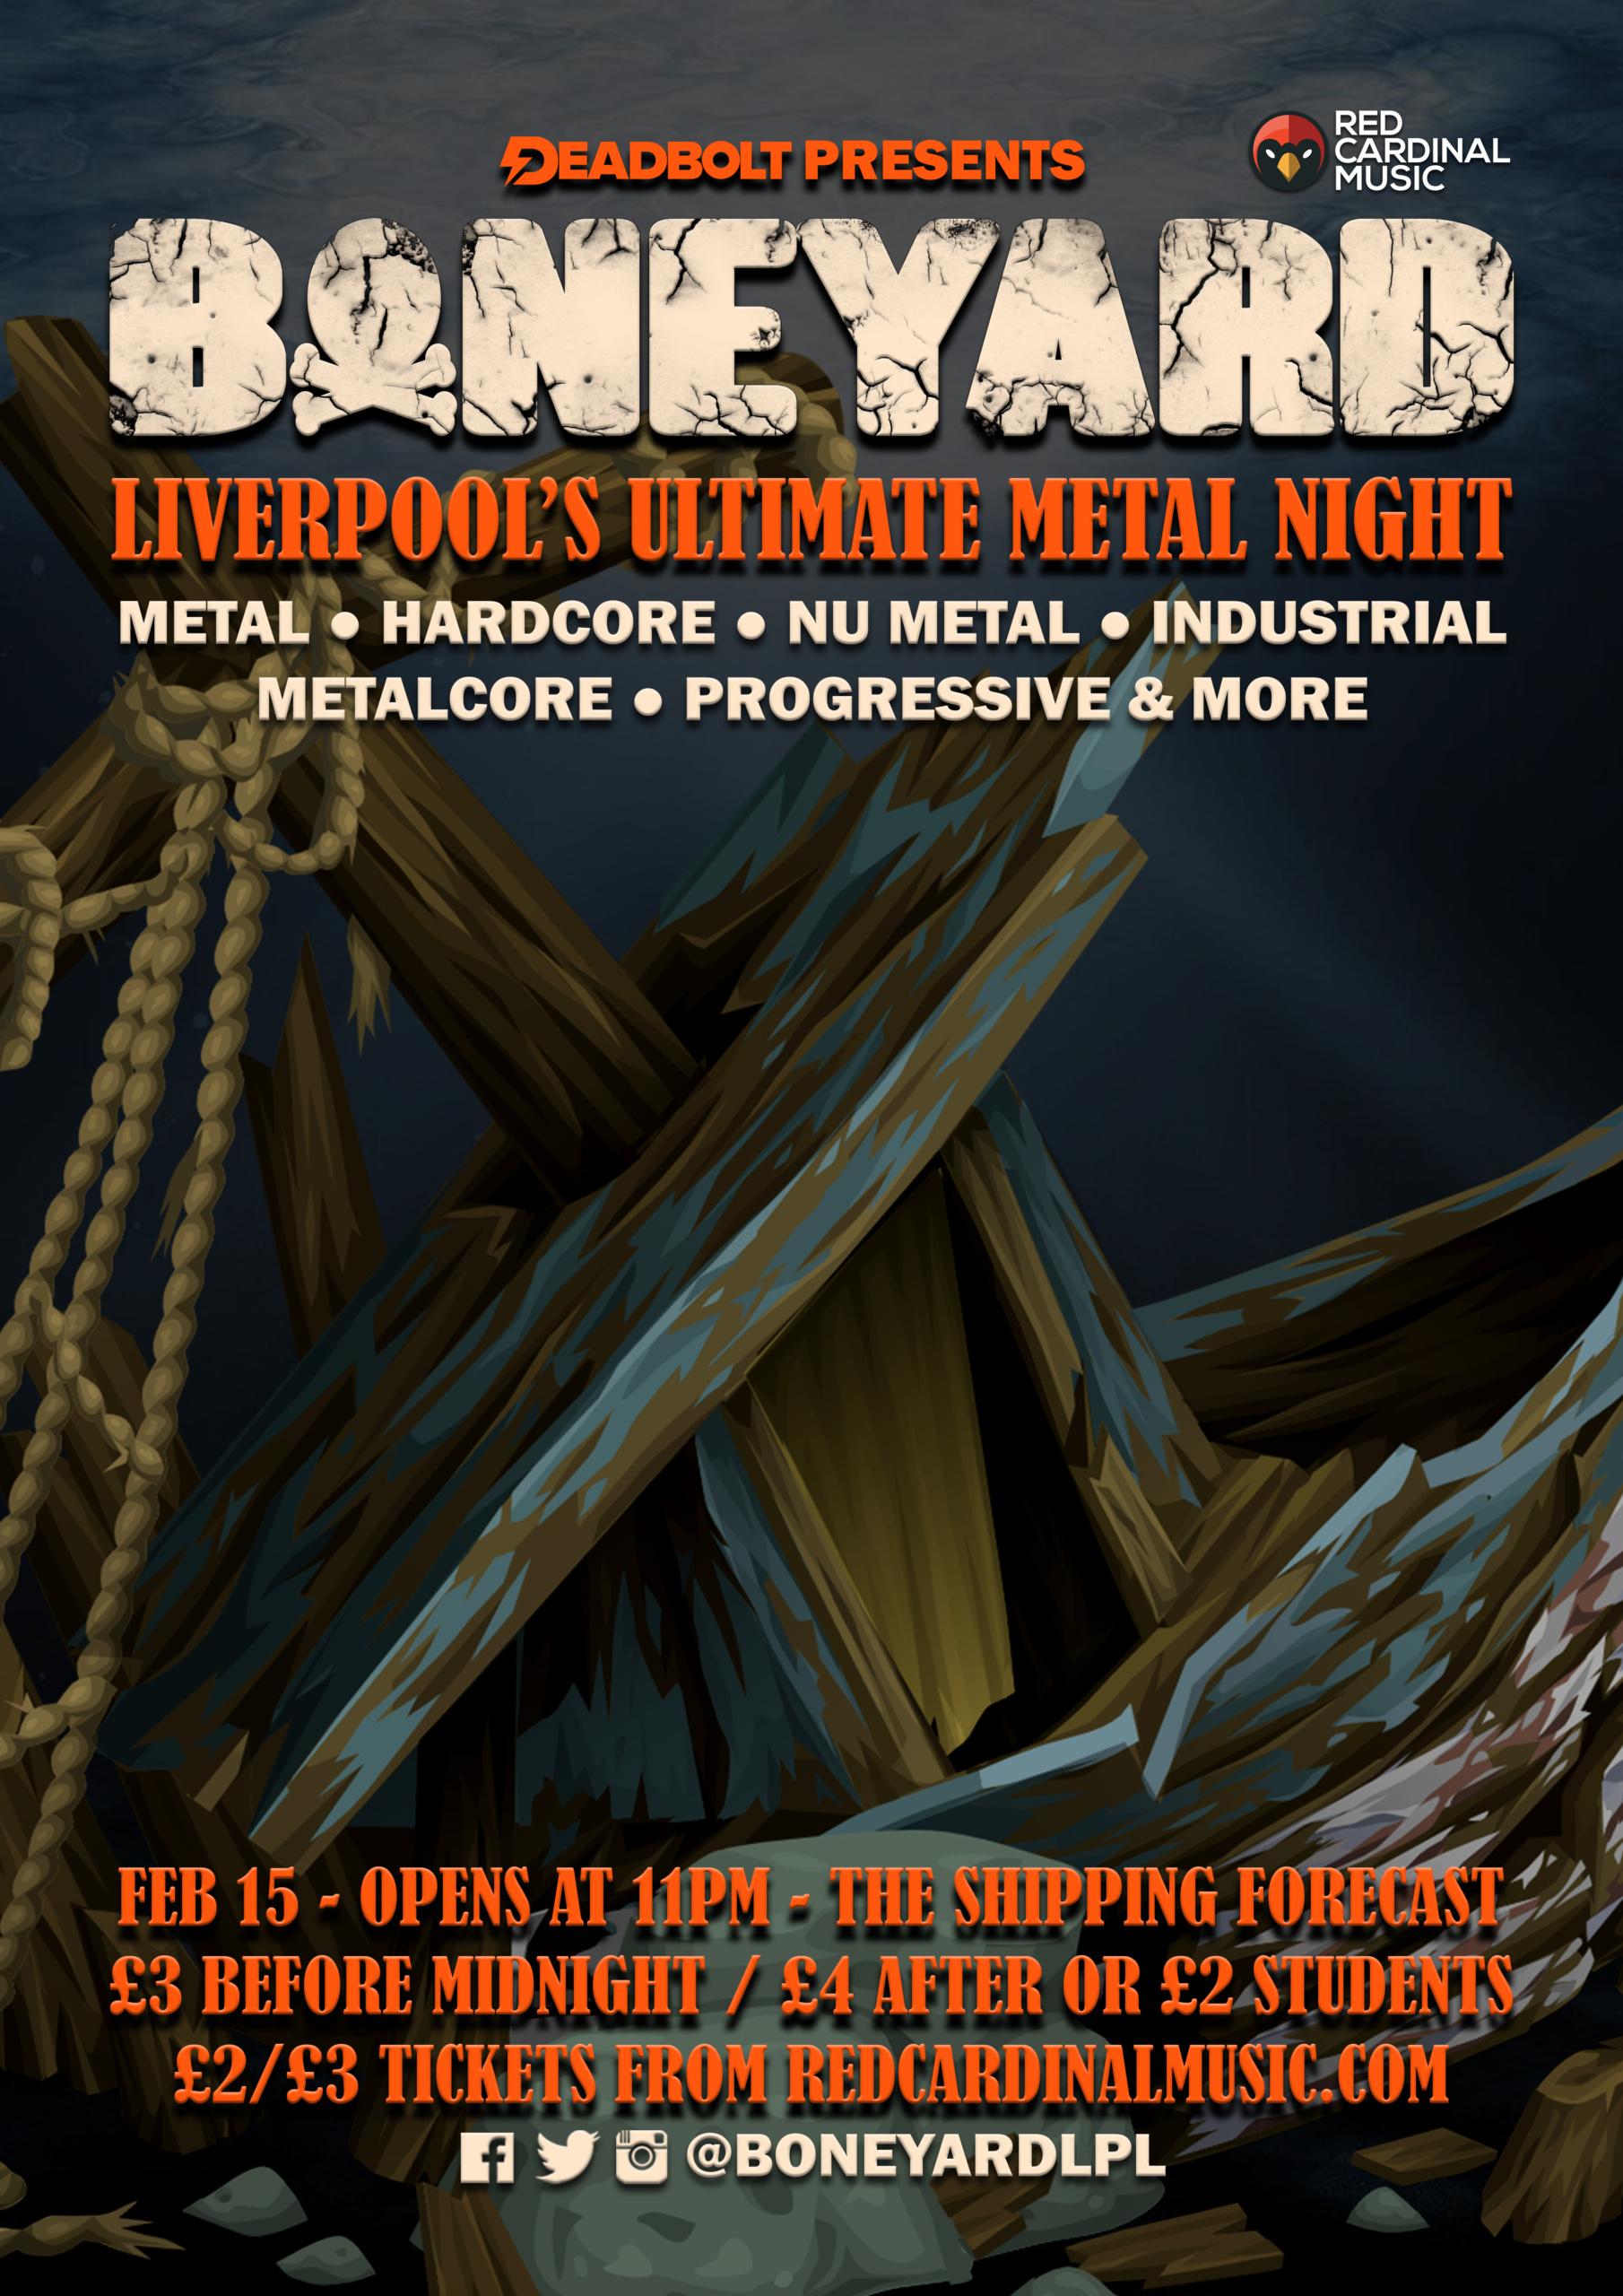 Boneyard - Metal Night - Shipping Forecast Liverpool - Feb 20 - Poster - Red Cardinal Music